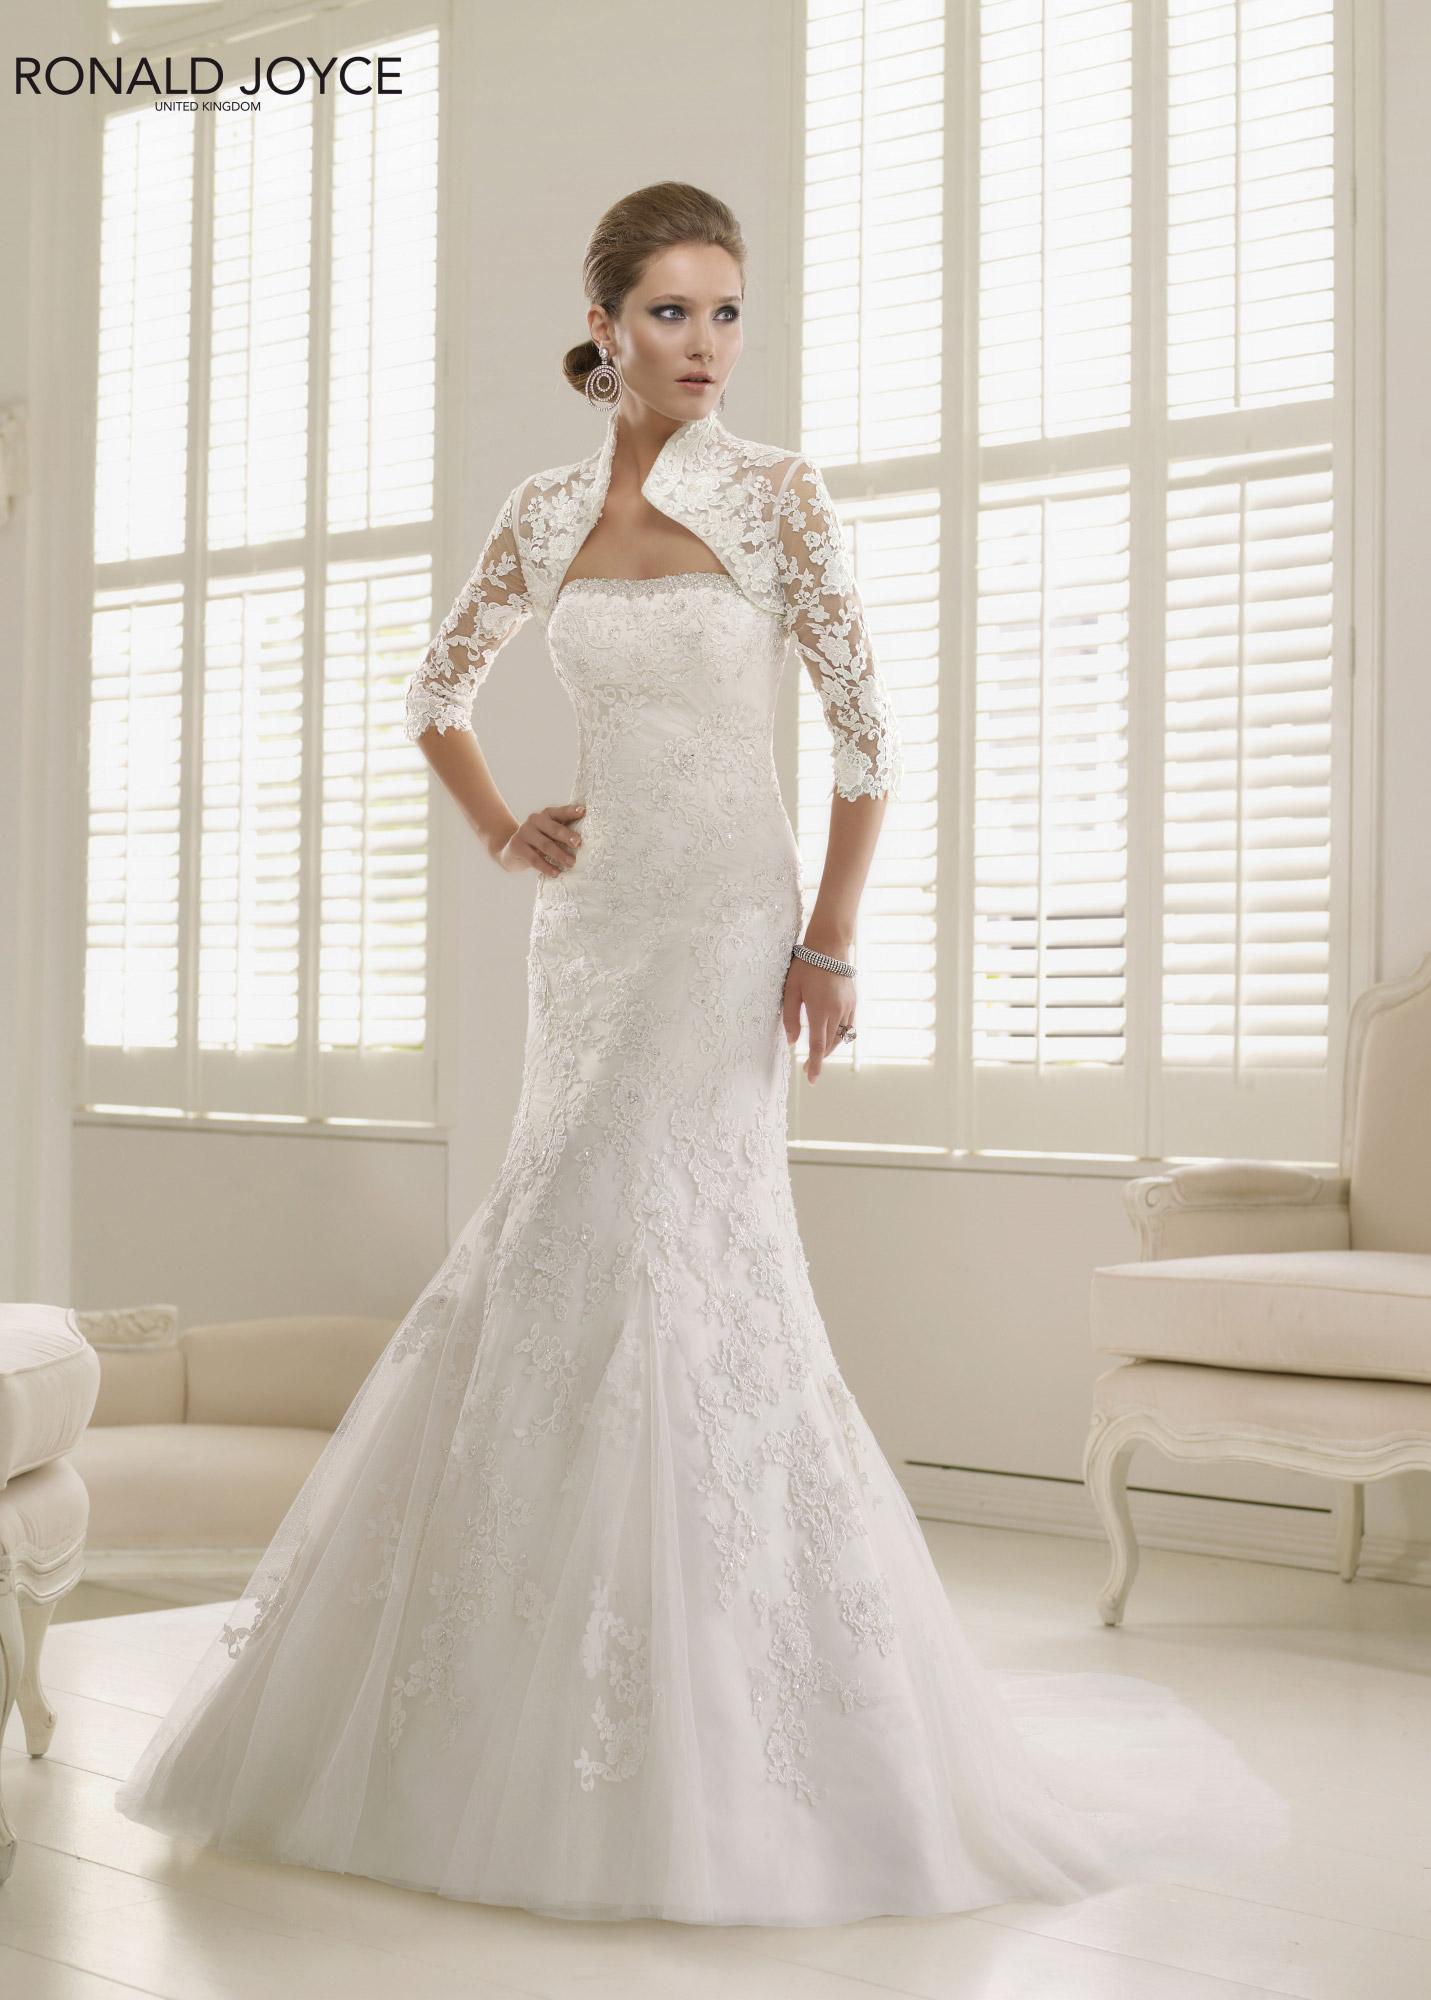 Abiti da sposa 2014 ronald joyce roma salem spose for Wedding dress in paris